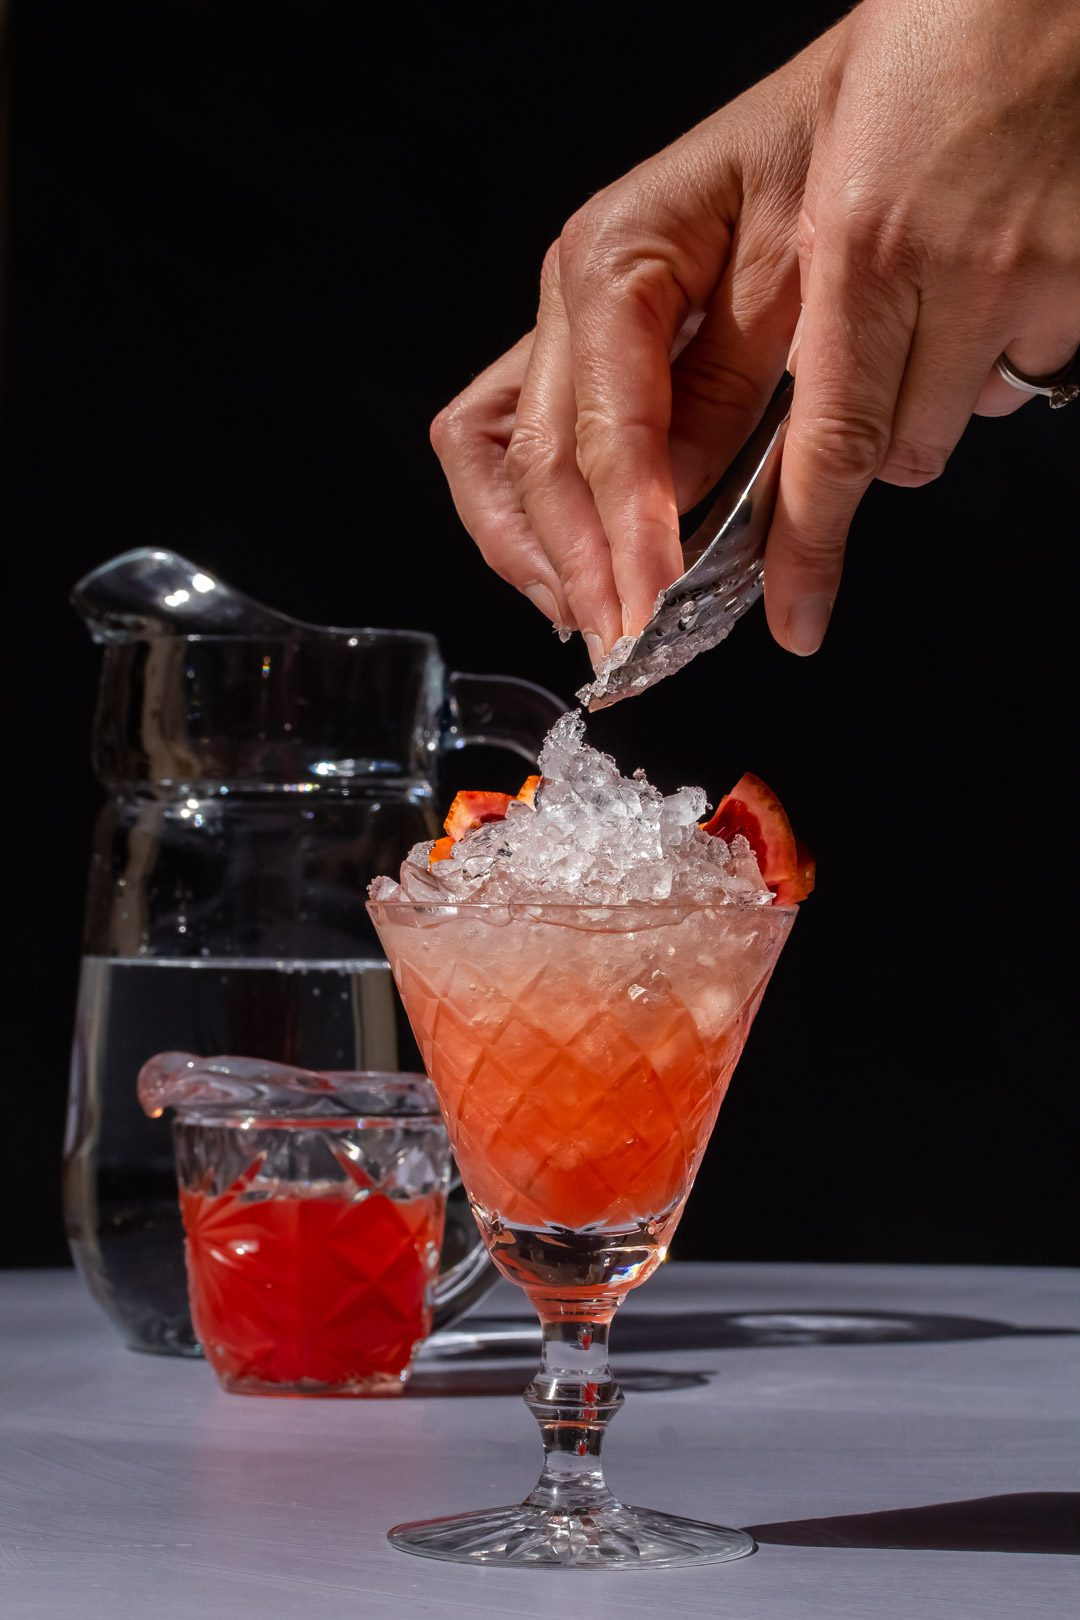 tipping ice onto improved strawberry shrub